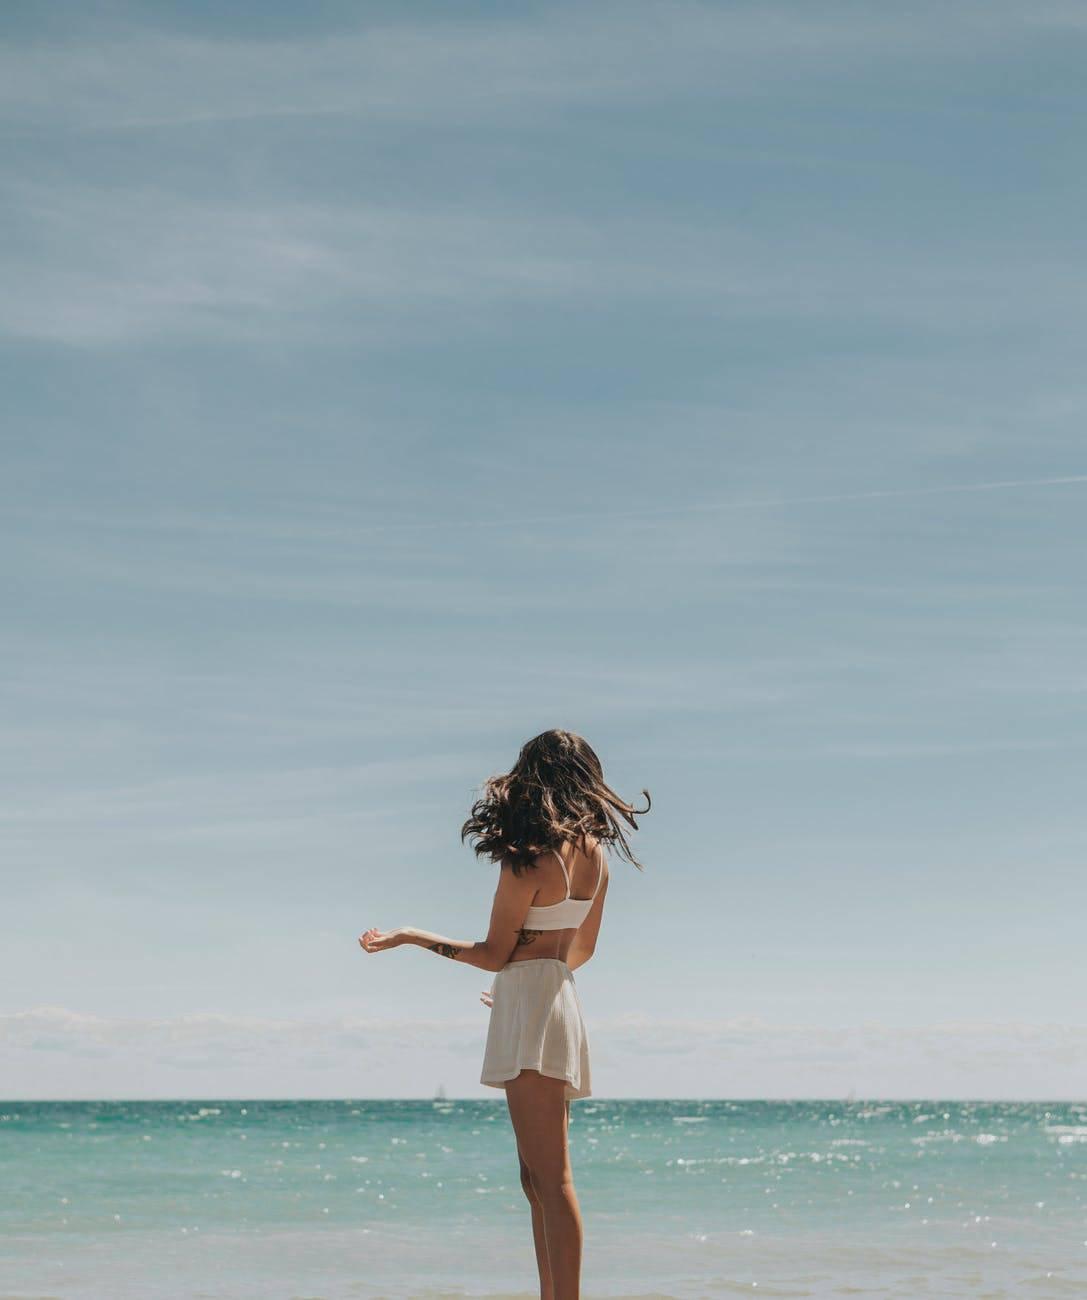 young woman enjoying summer day on beach